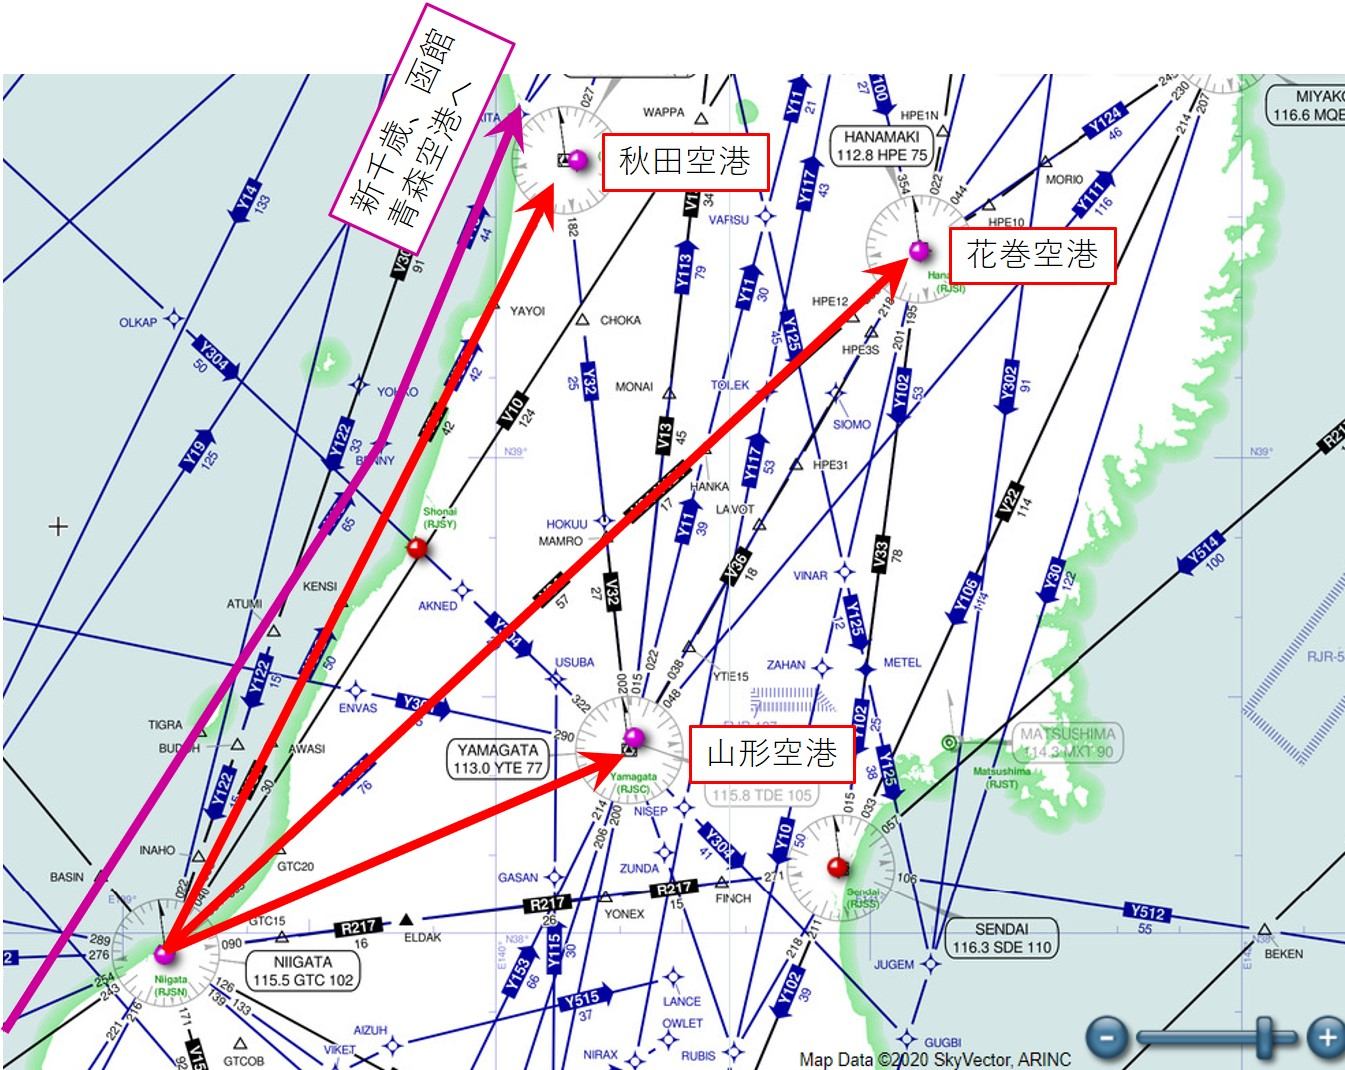 GUJYO・NAGOYA以降の飛行経路の続き